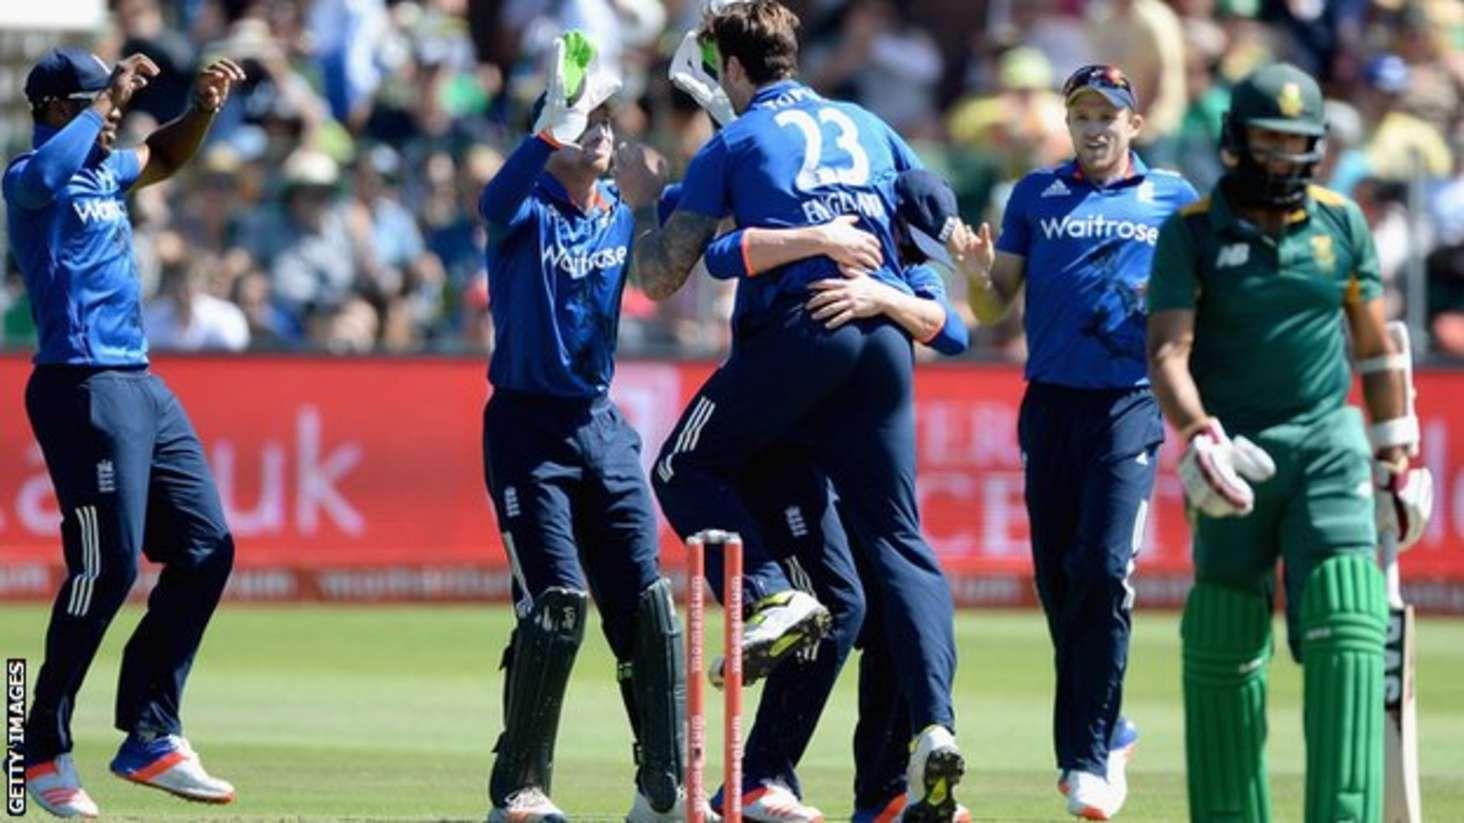 England beat South Africa in Port Elizabeth for 20 ODI